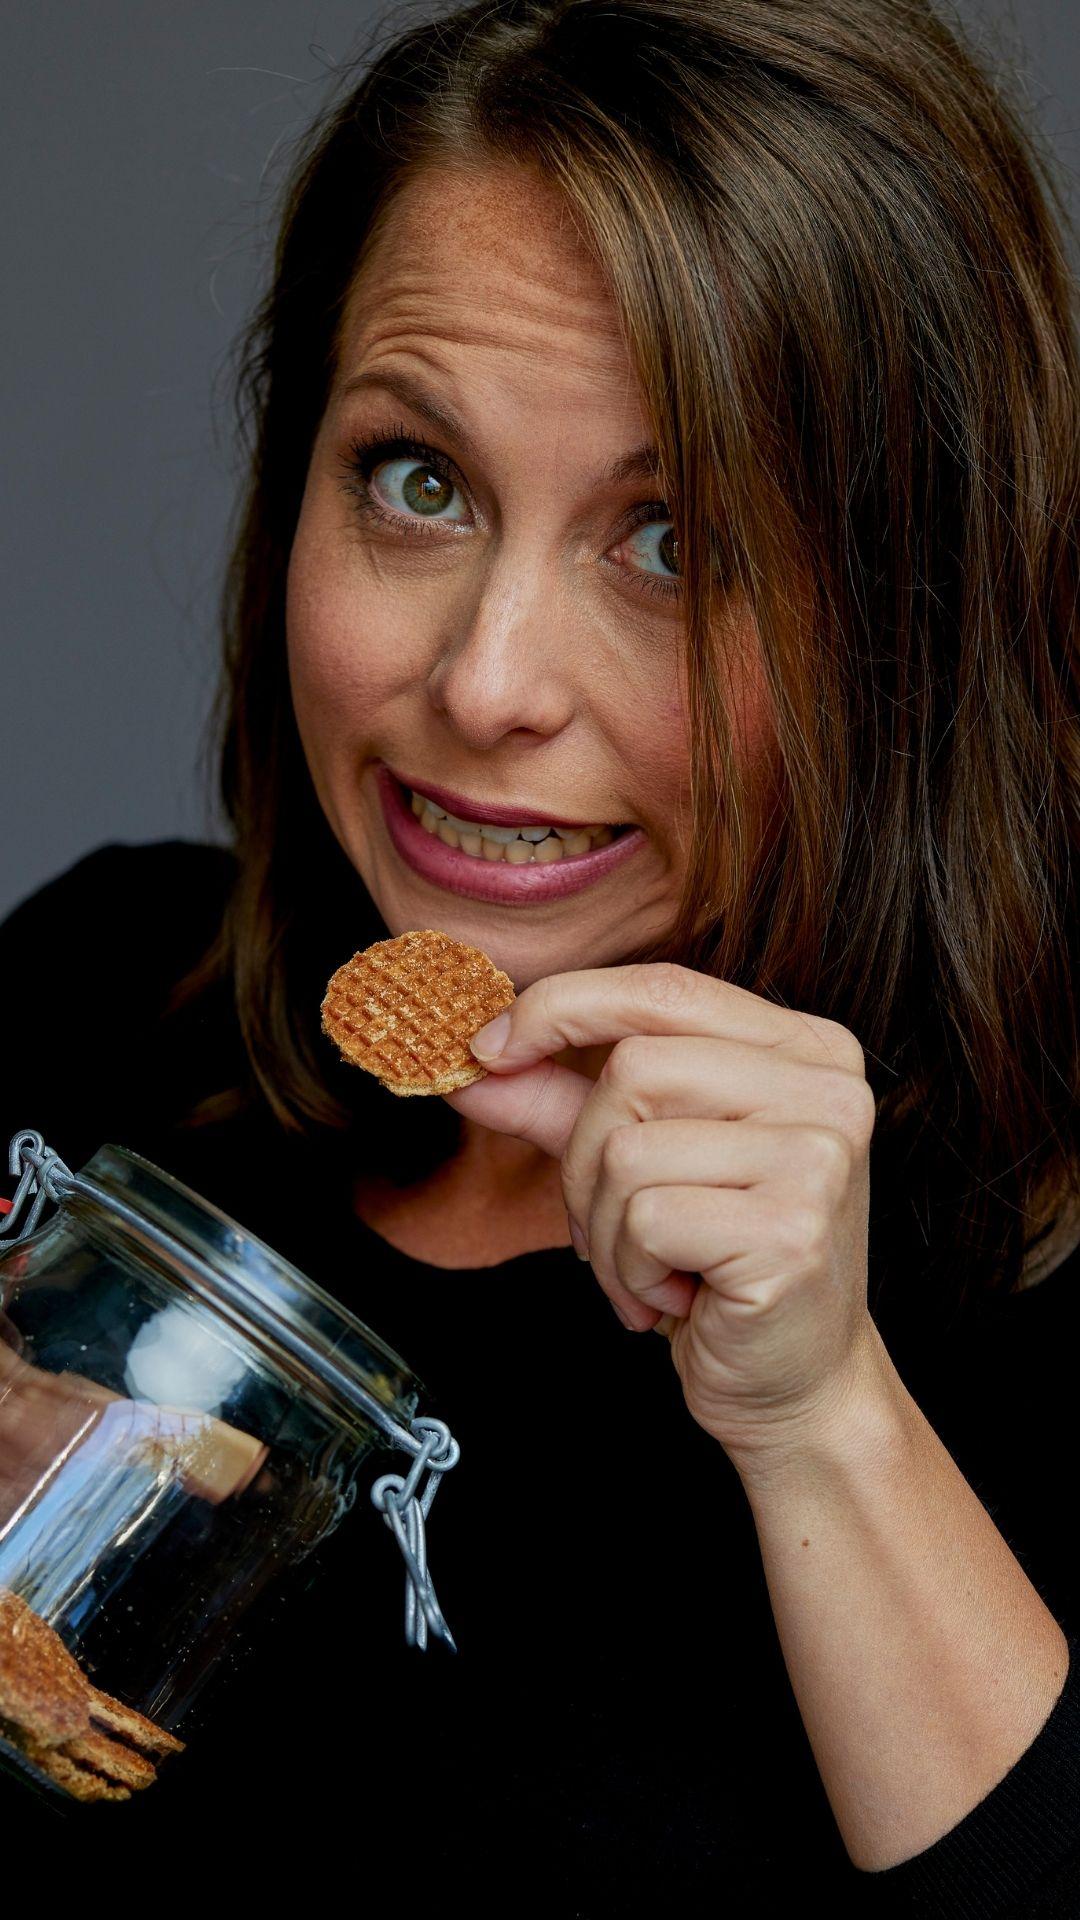 Desiree Graste - koekjes eten